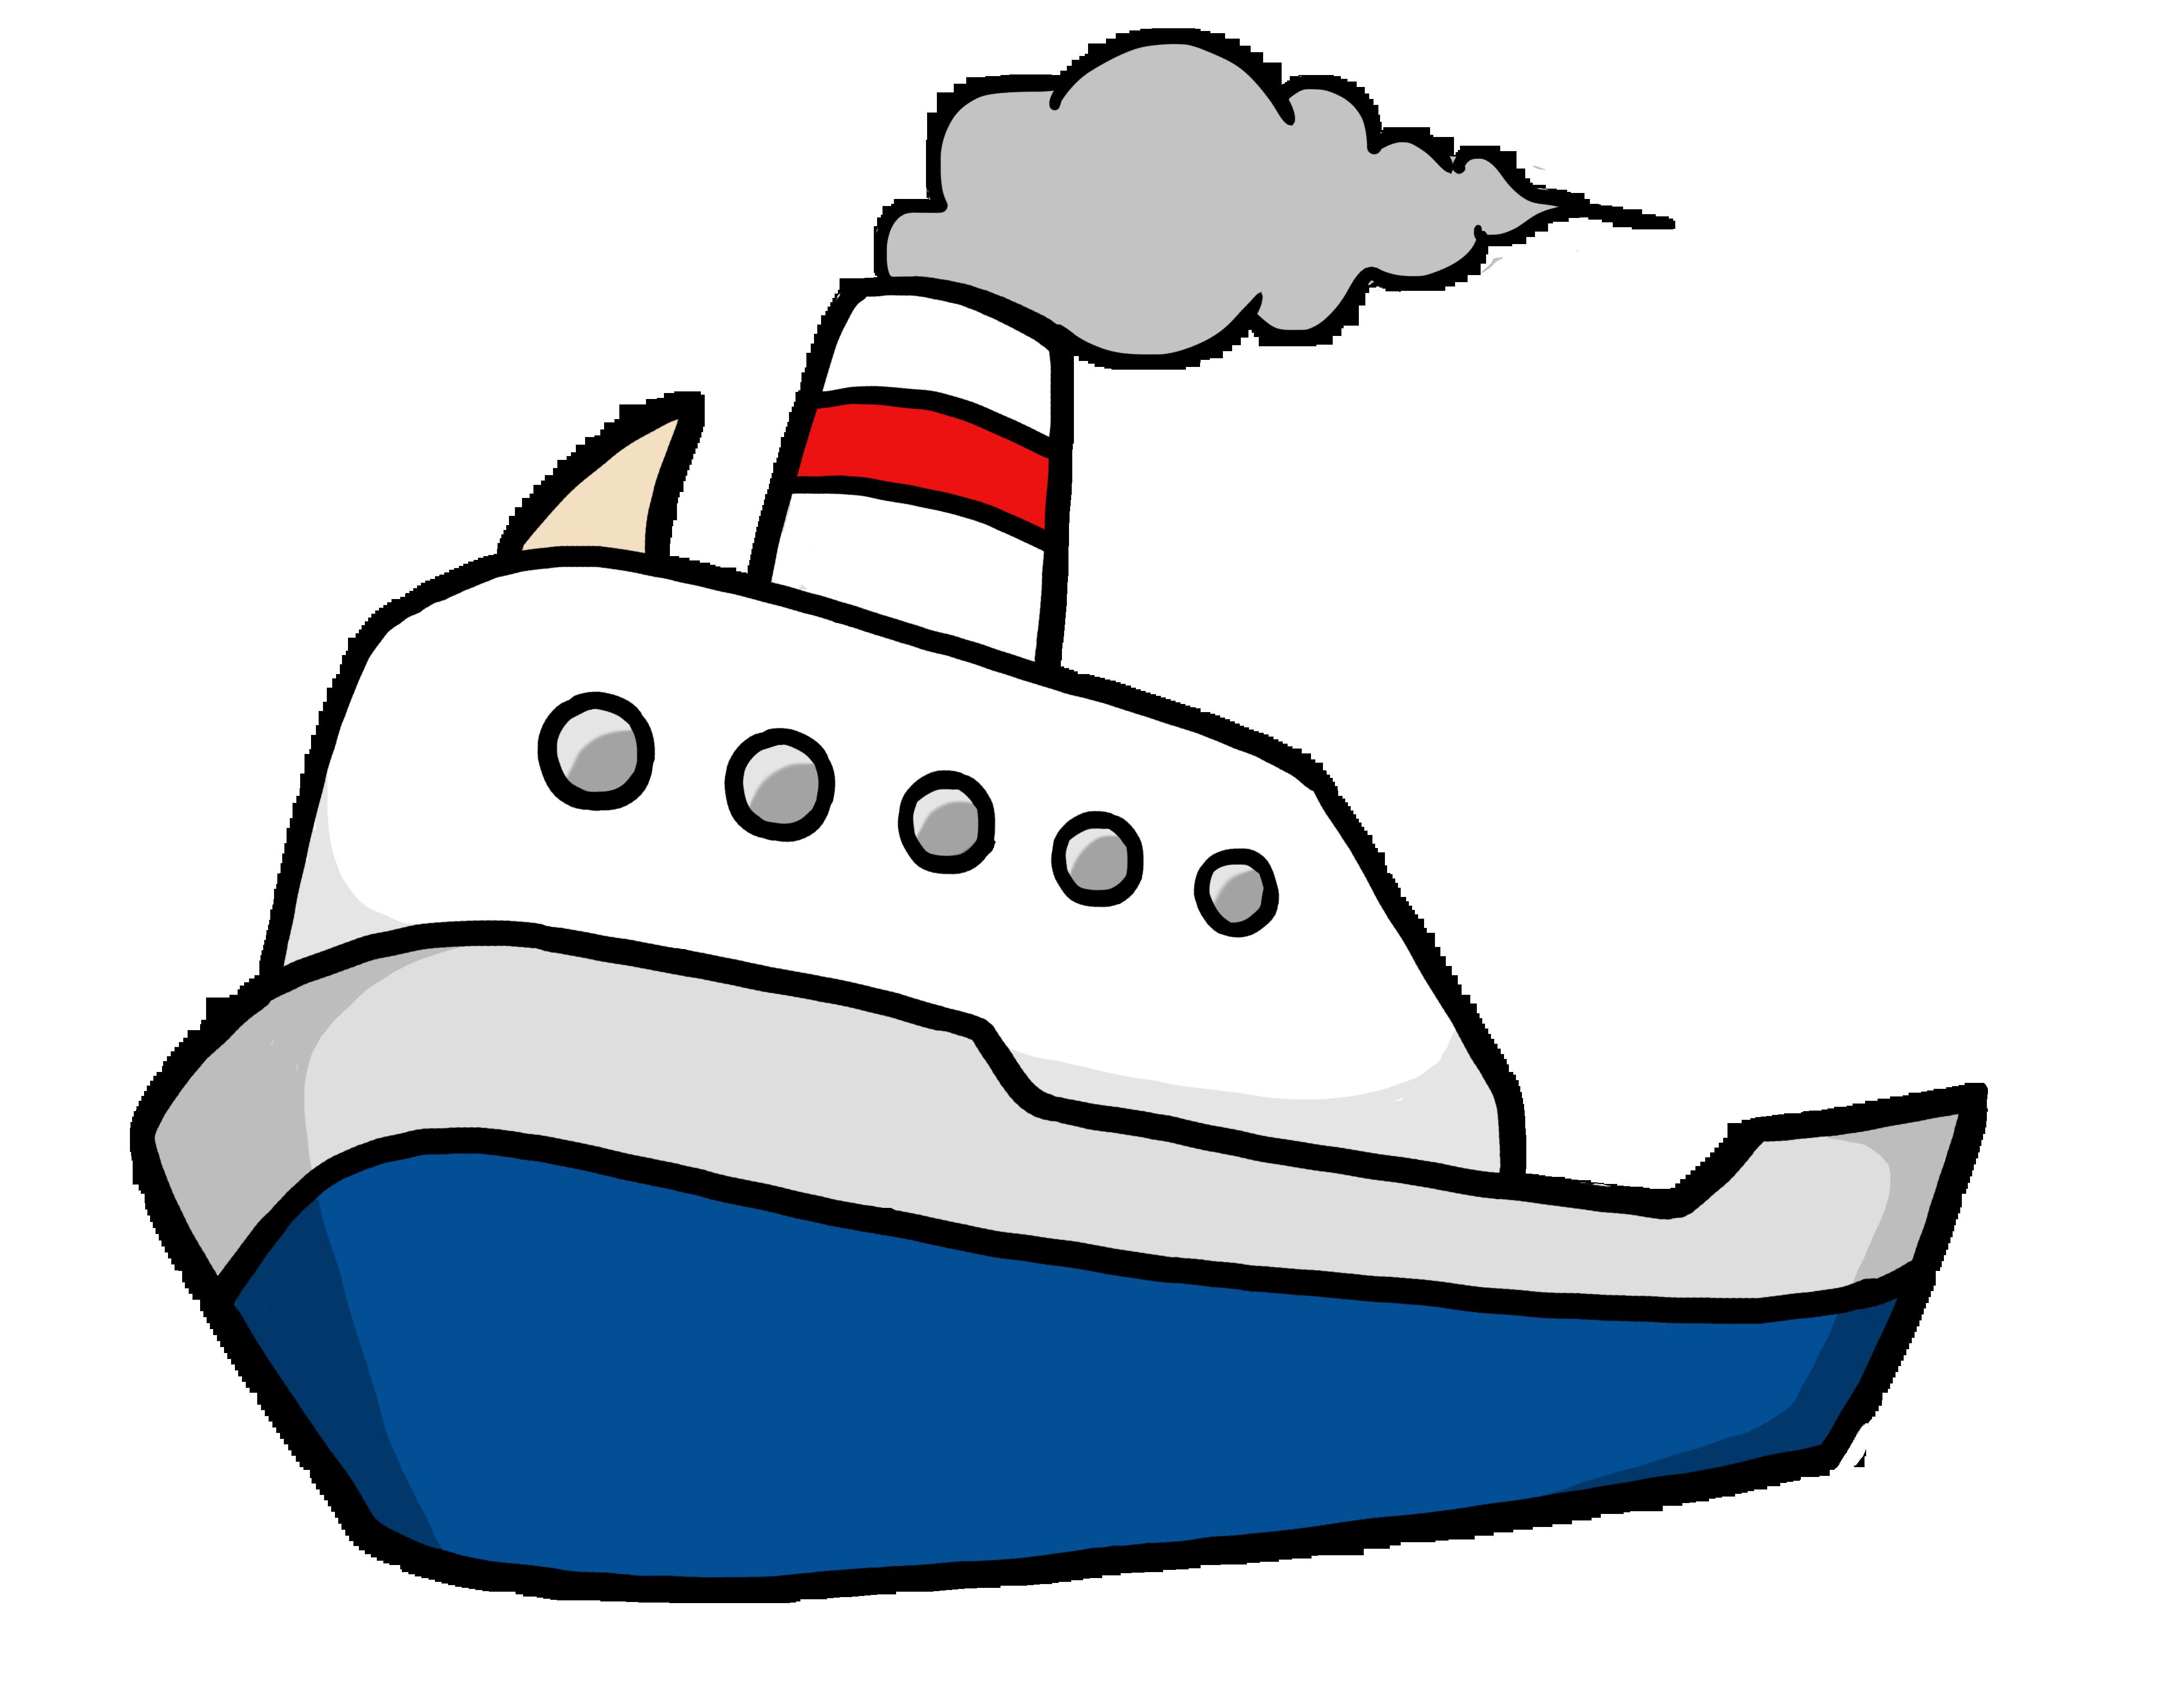 4000x3142 Row Boat Clipart Boat Clip Art Morze Clip Art